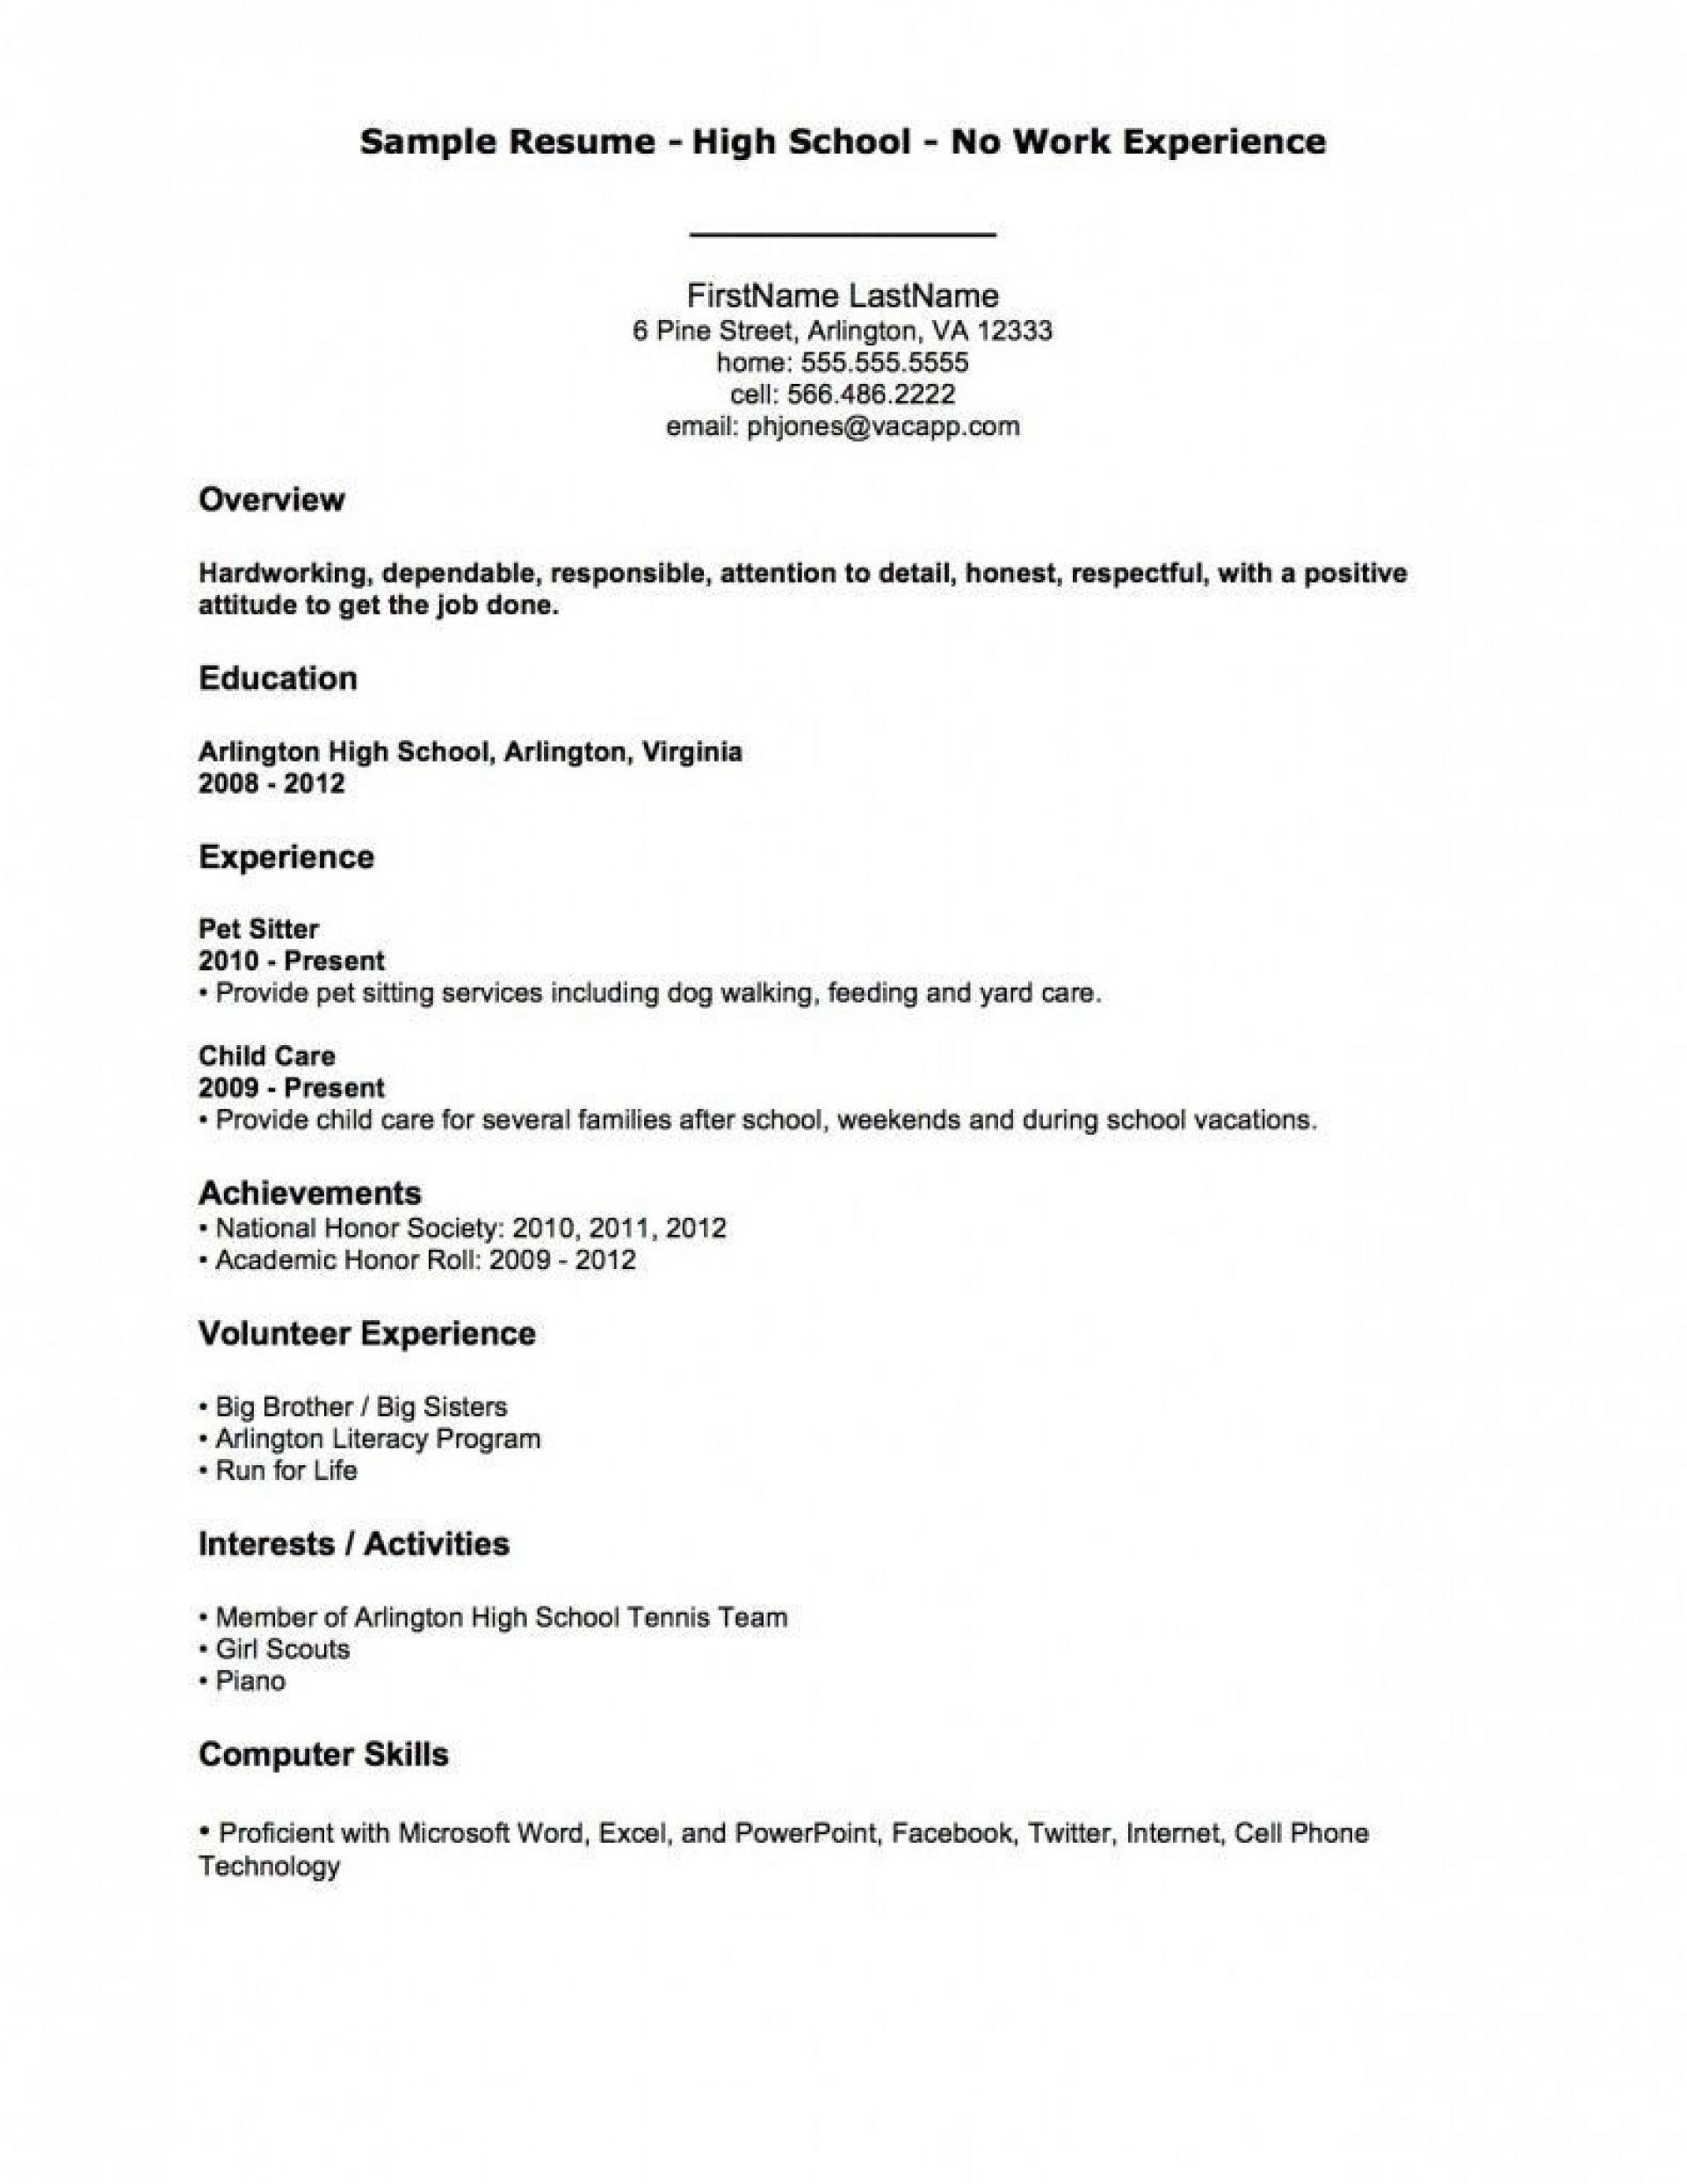 004 Fantastic Resume Template For Teen Image  Teenager First Job Australia1920